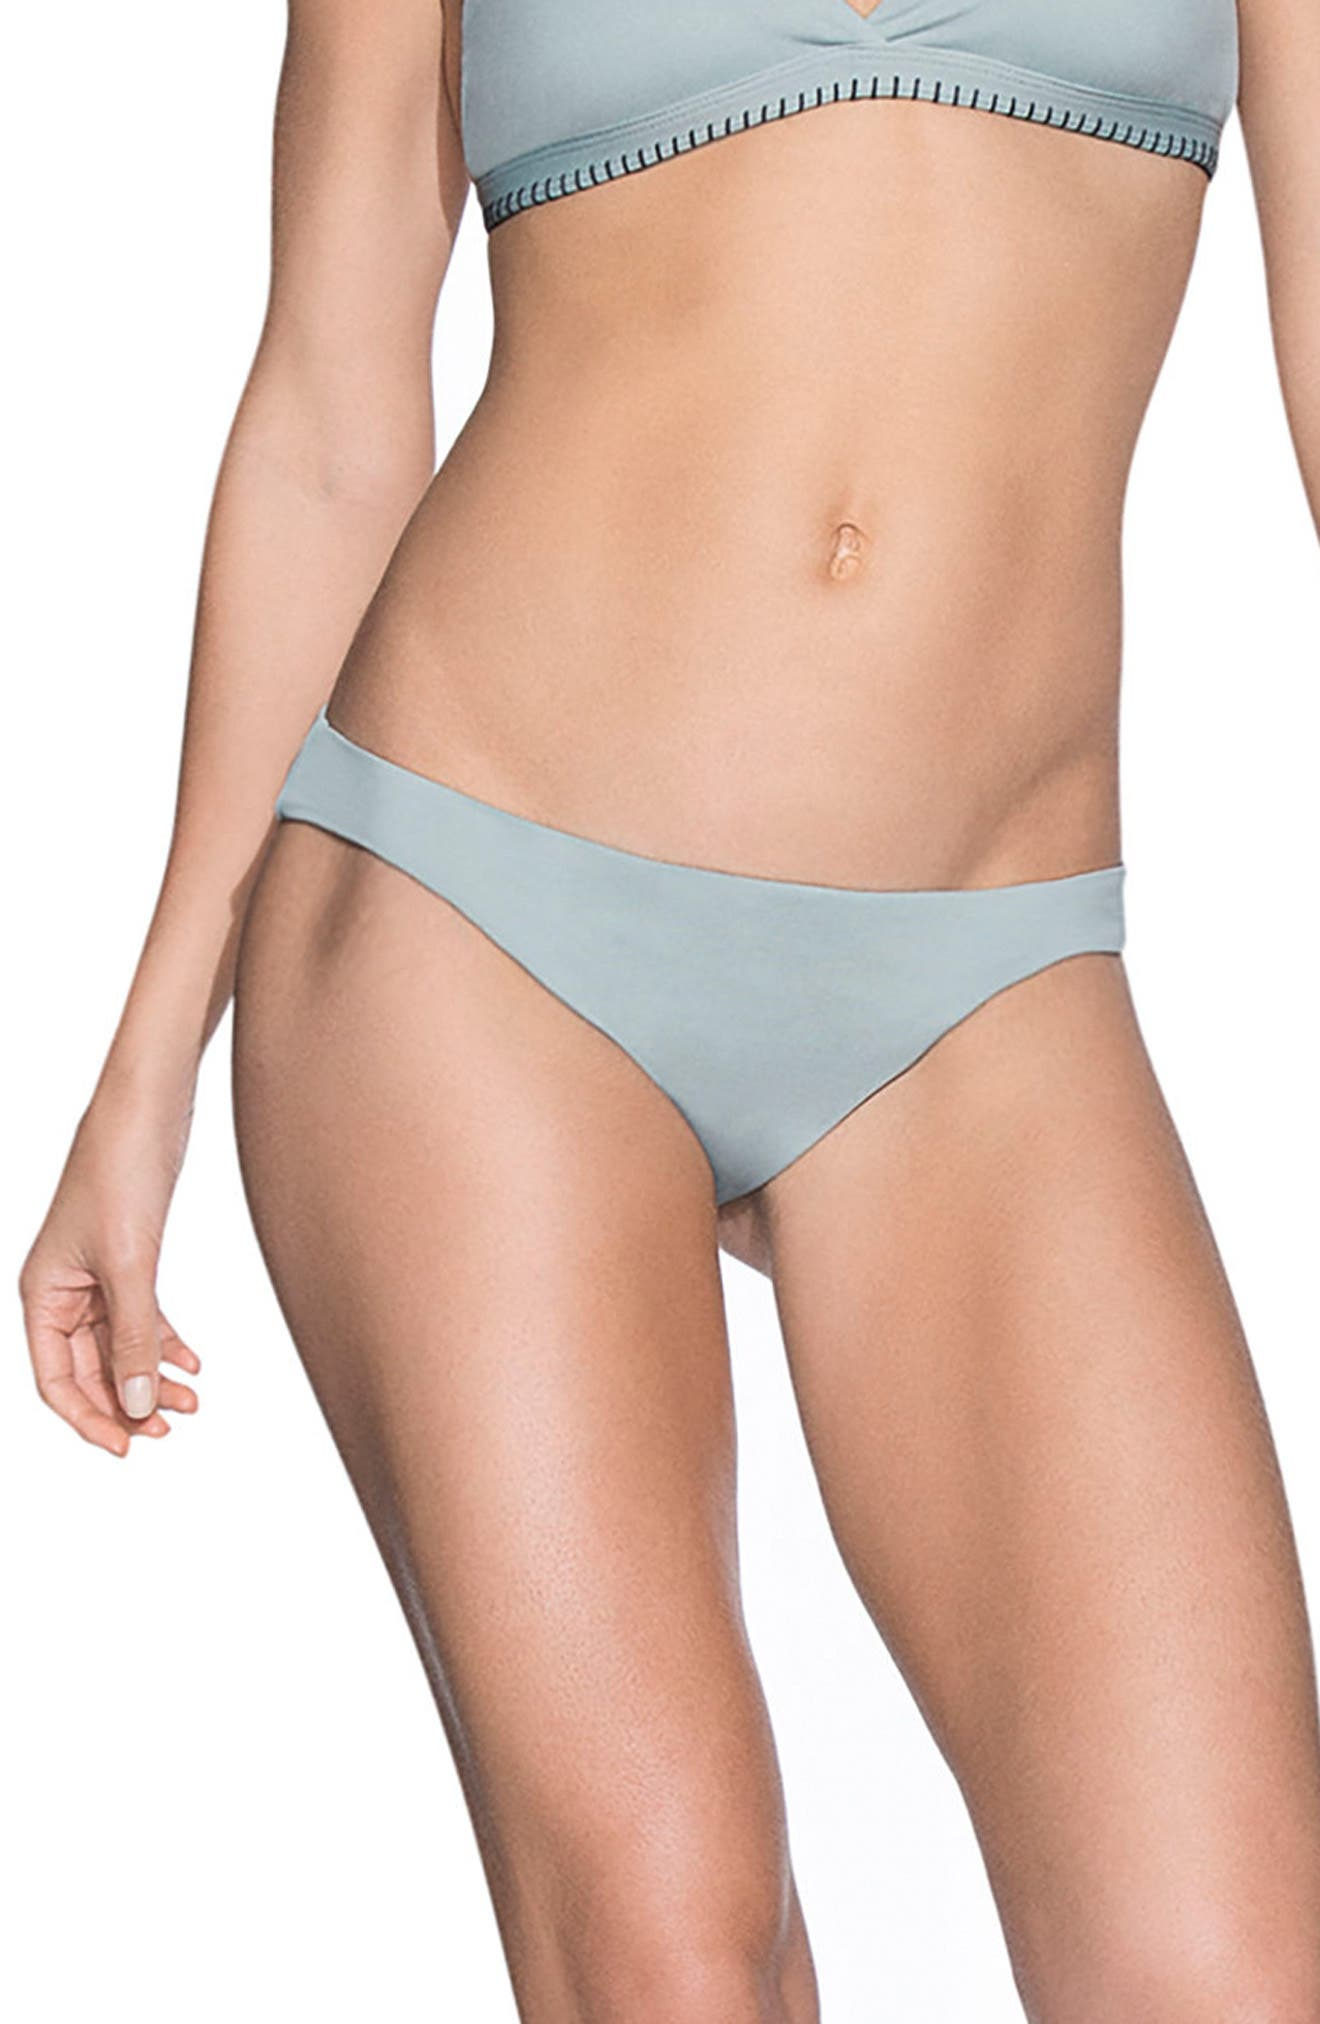 Lily Pad Flirt Signature Cut Reversible Bikini Bottoms,                         Main,                         color, Open Green